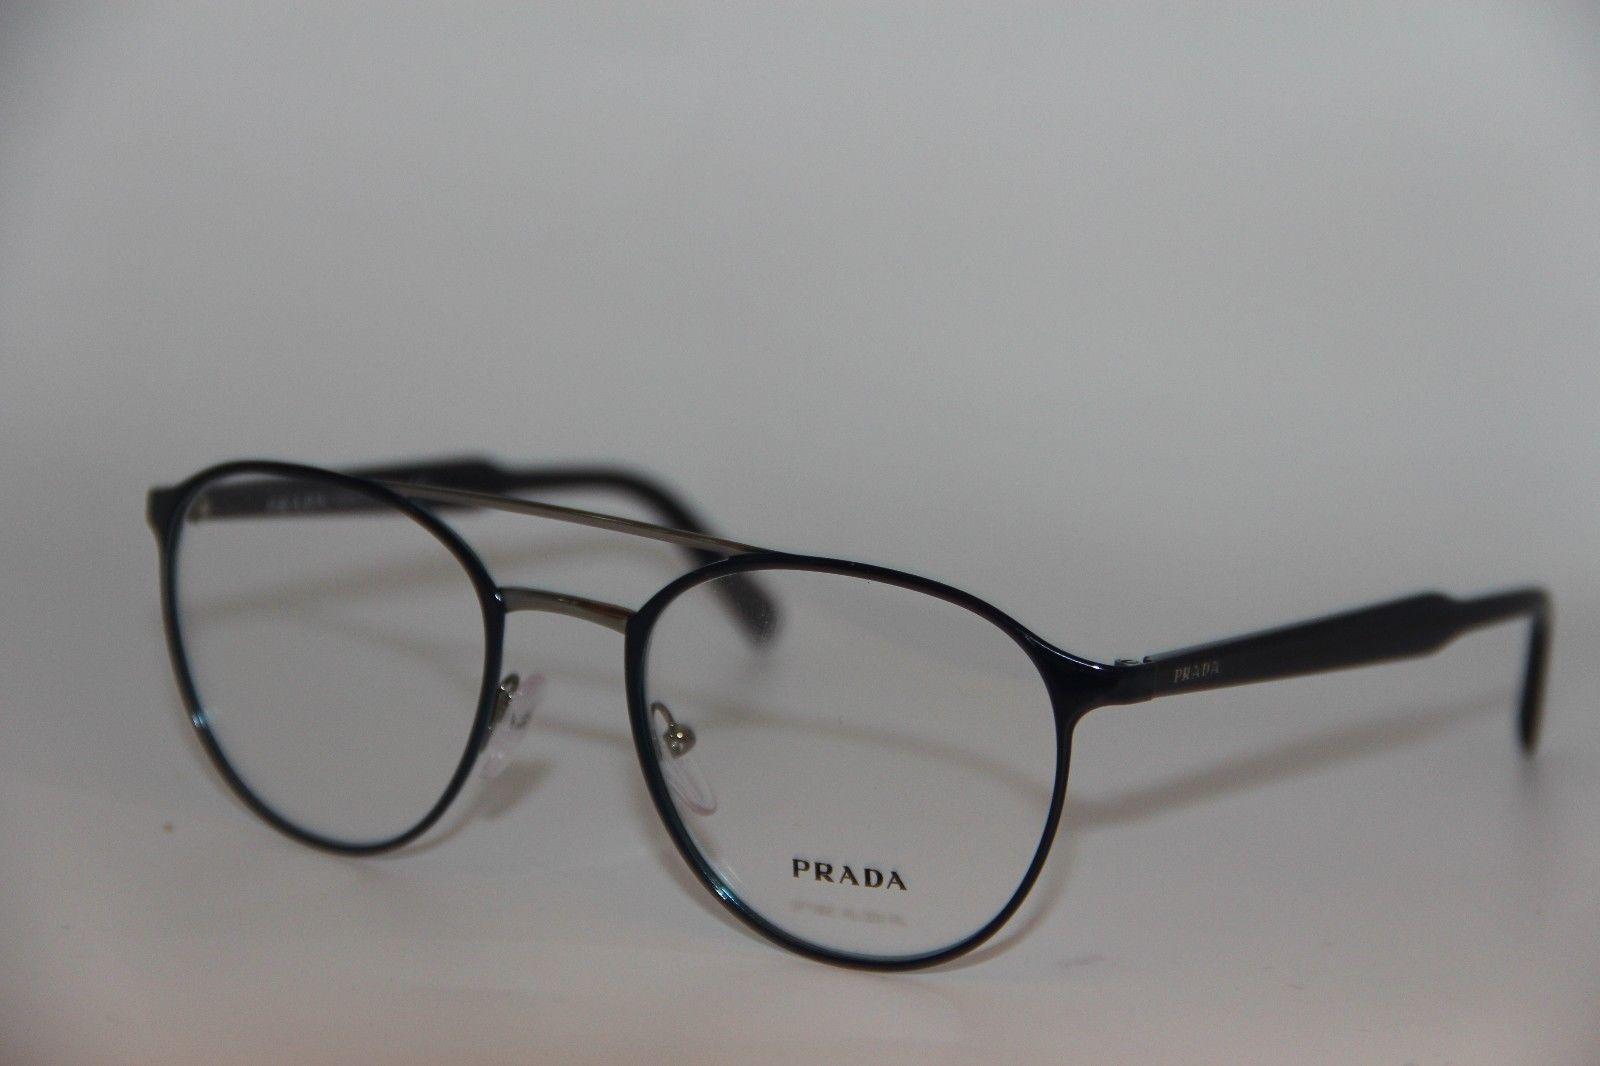 a17561c93054 New Prada Vpr 60T VAZ-1O1 Blue Eyeglasses and 50 similar items